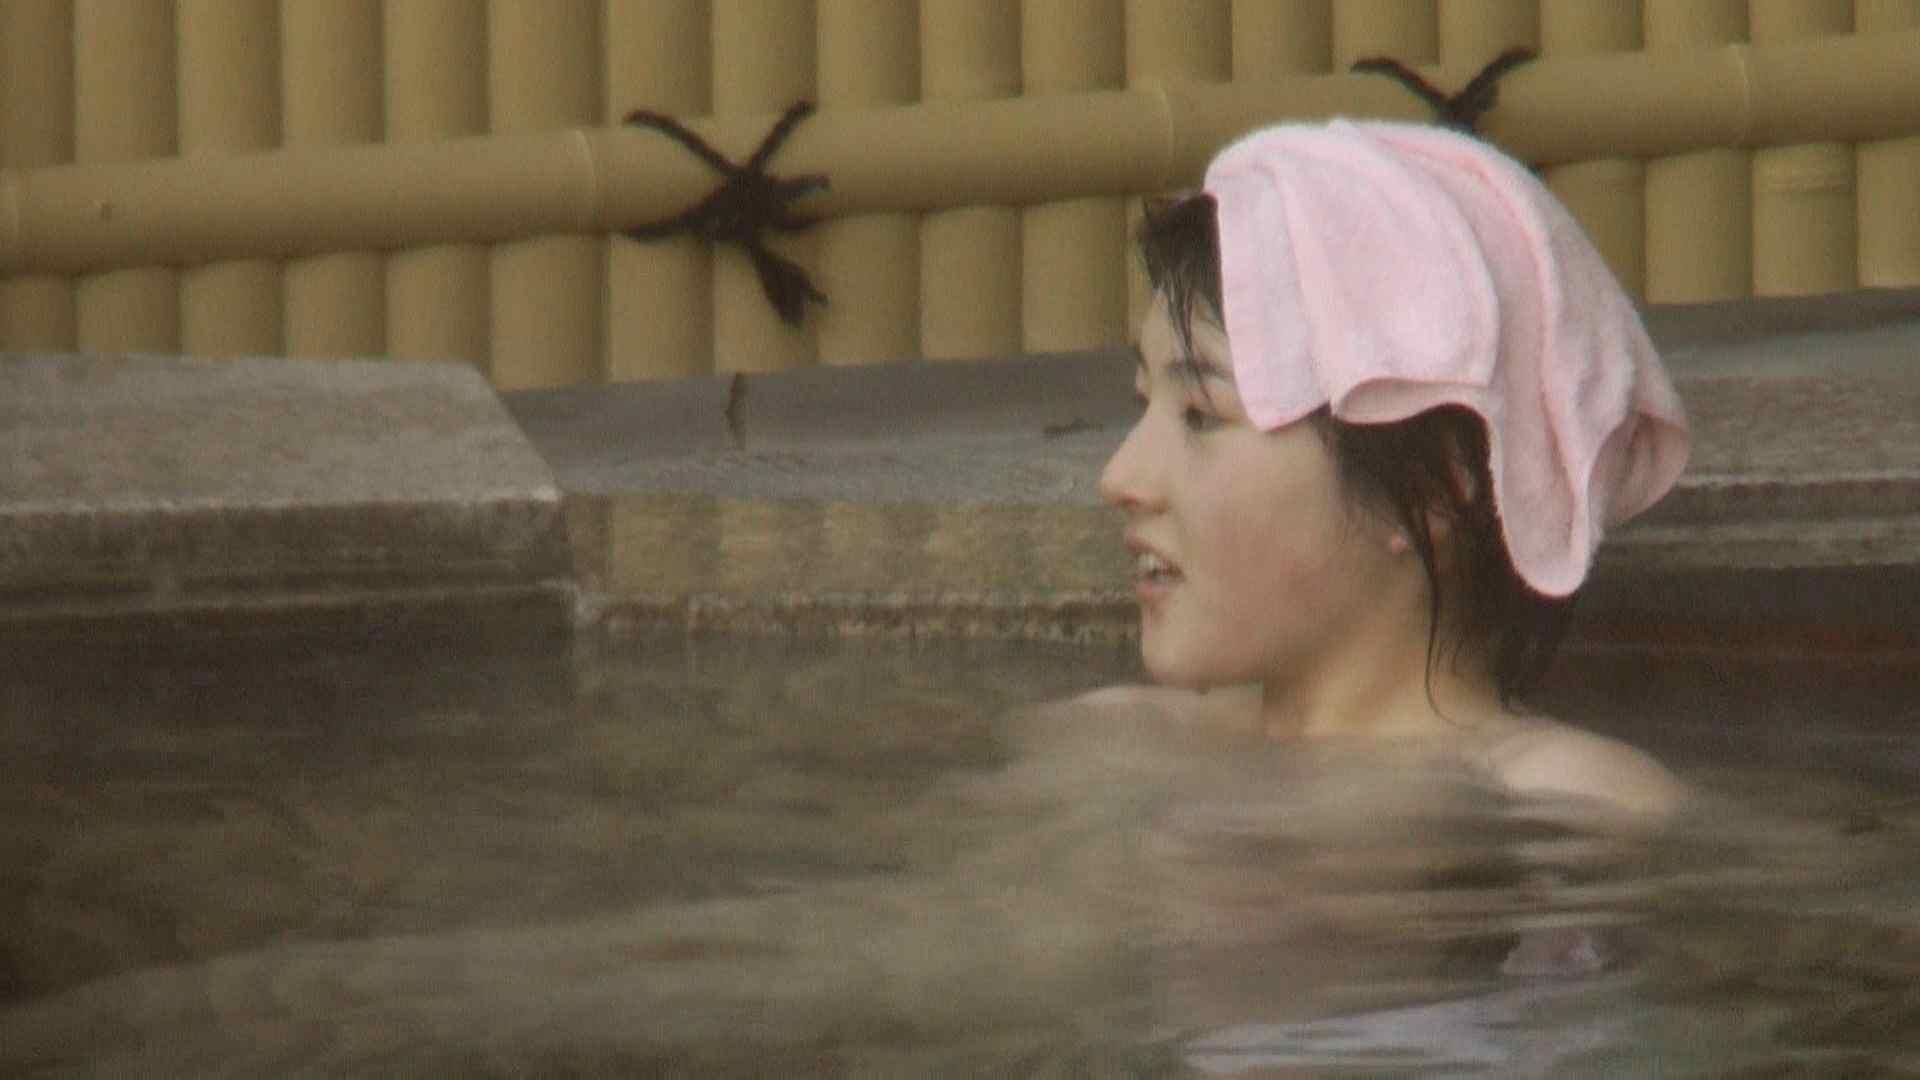 Aquaな露天風呂Vol.207 OLのエロ生活 | 露天風呂  98連発 61